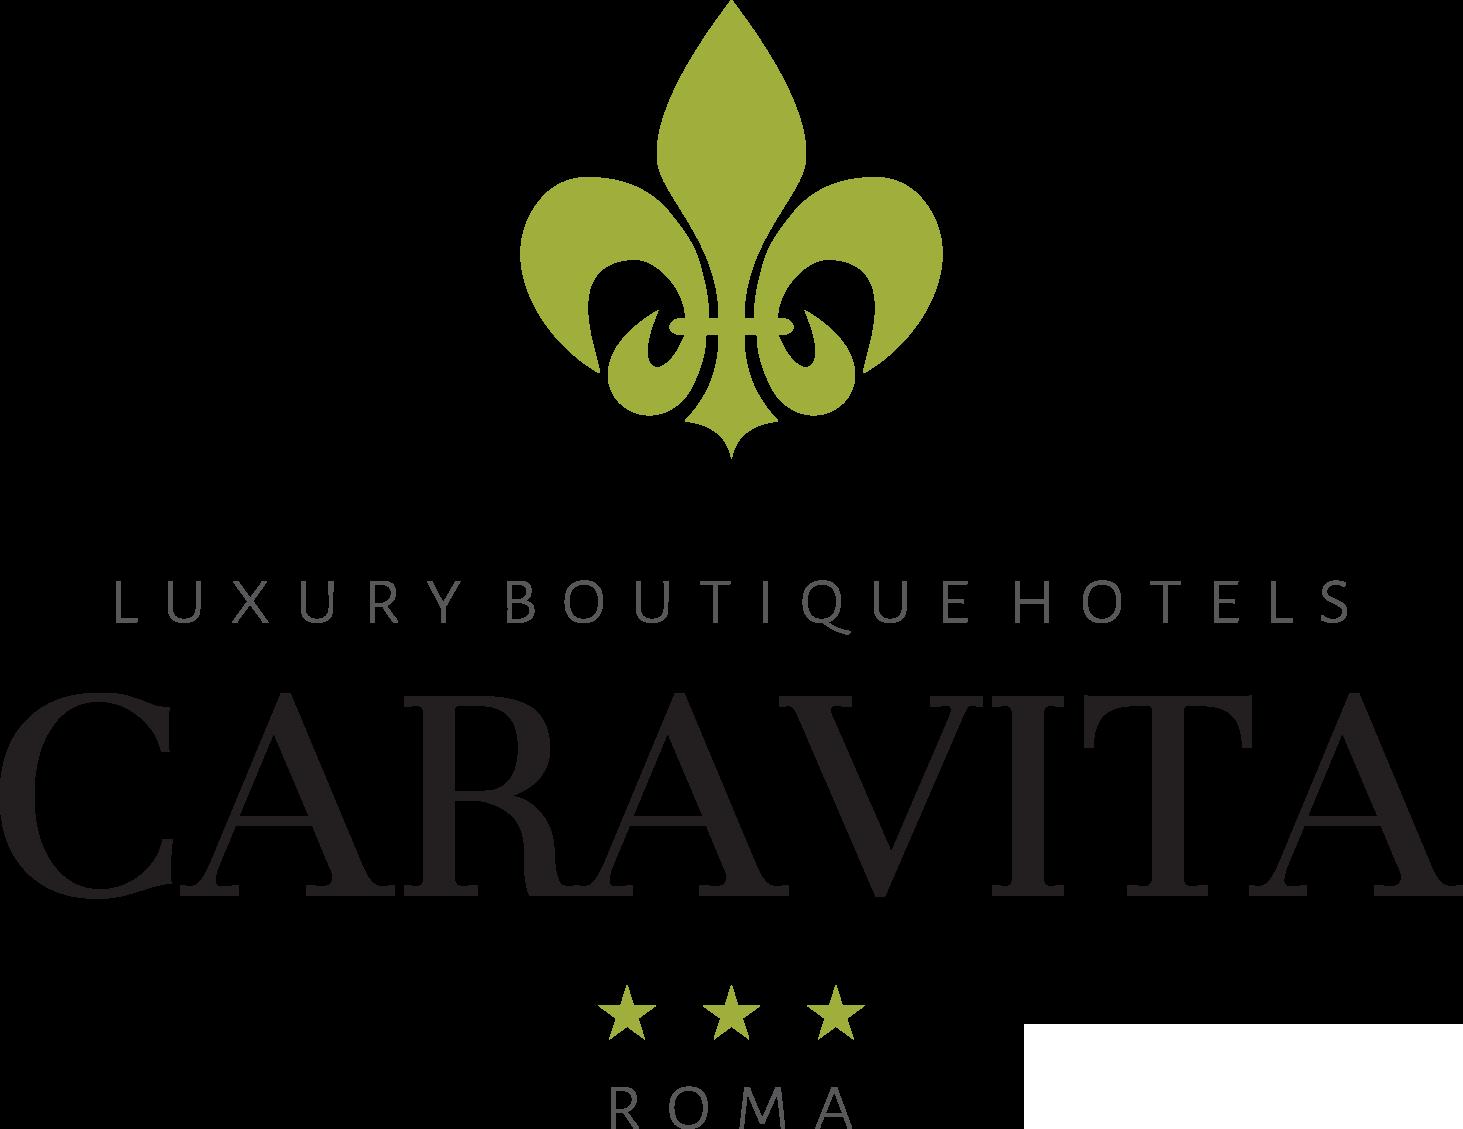 Logo LBH Hotel Caravita